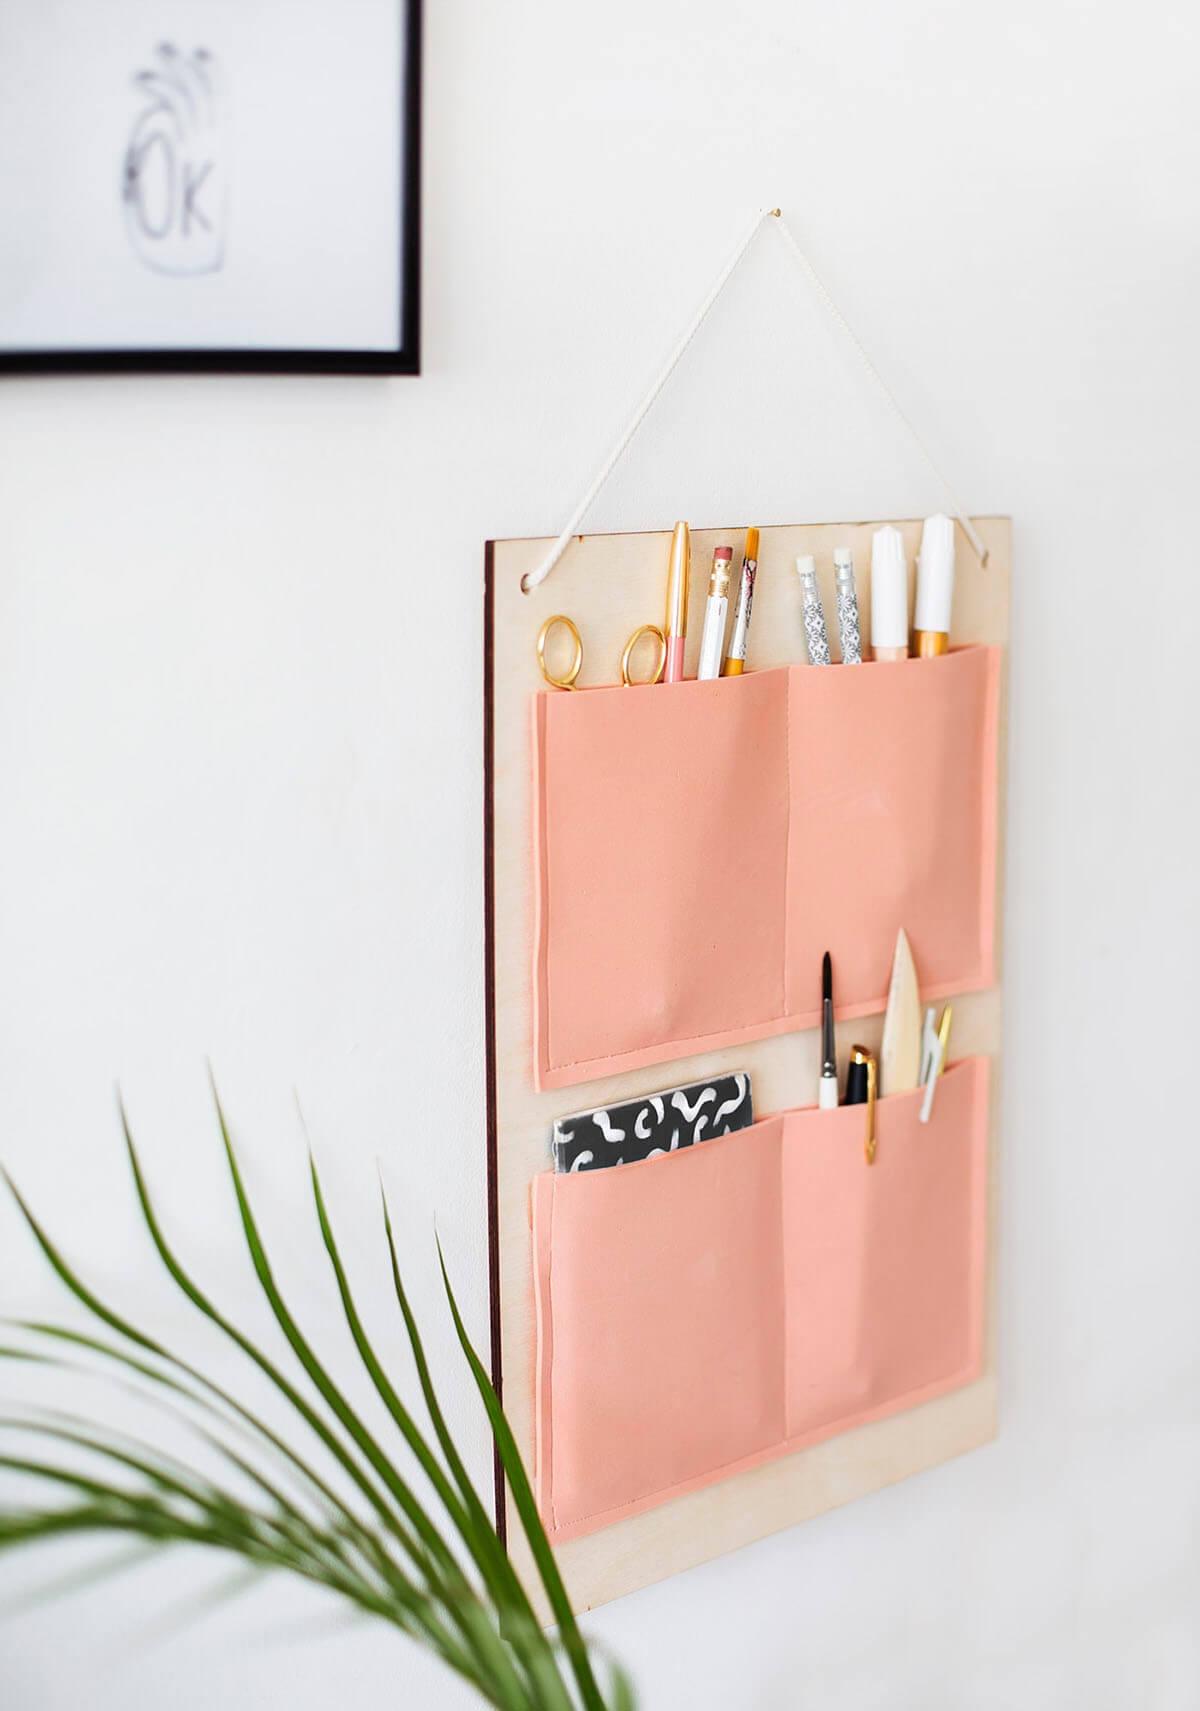 Peachy Keen Decorative Hanging Organizer